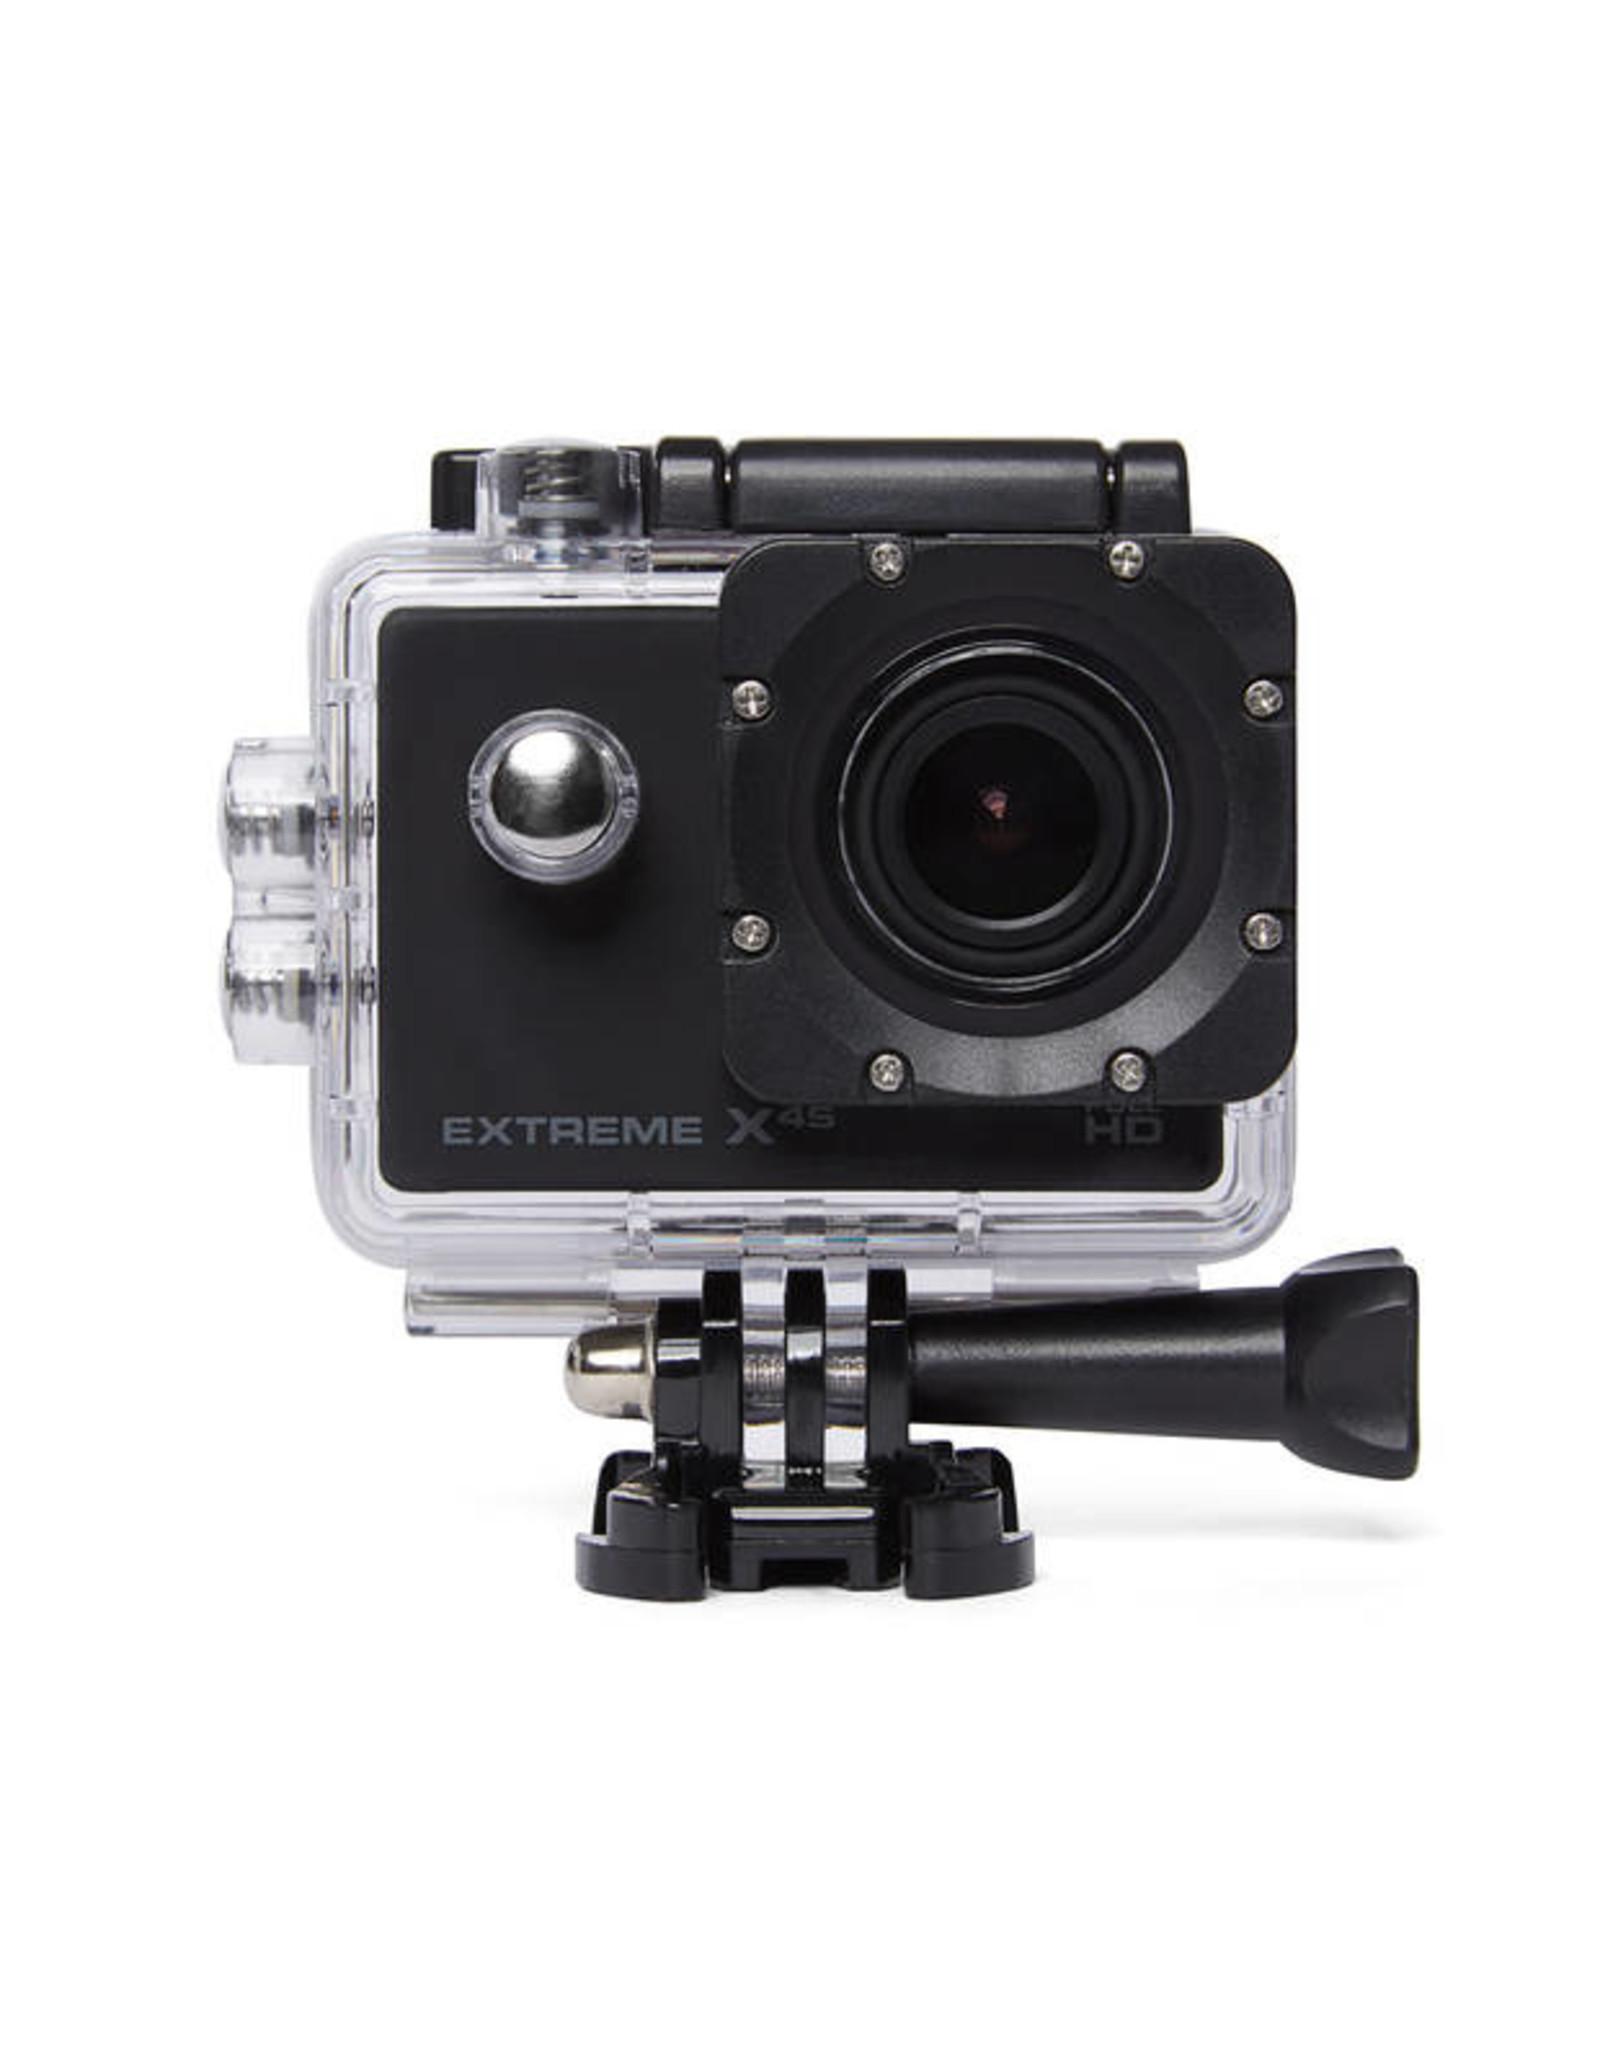 Vizu VIZU Extreme X4S Wi-Fi 1080p action camera